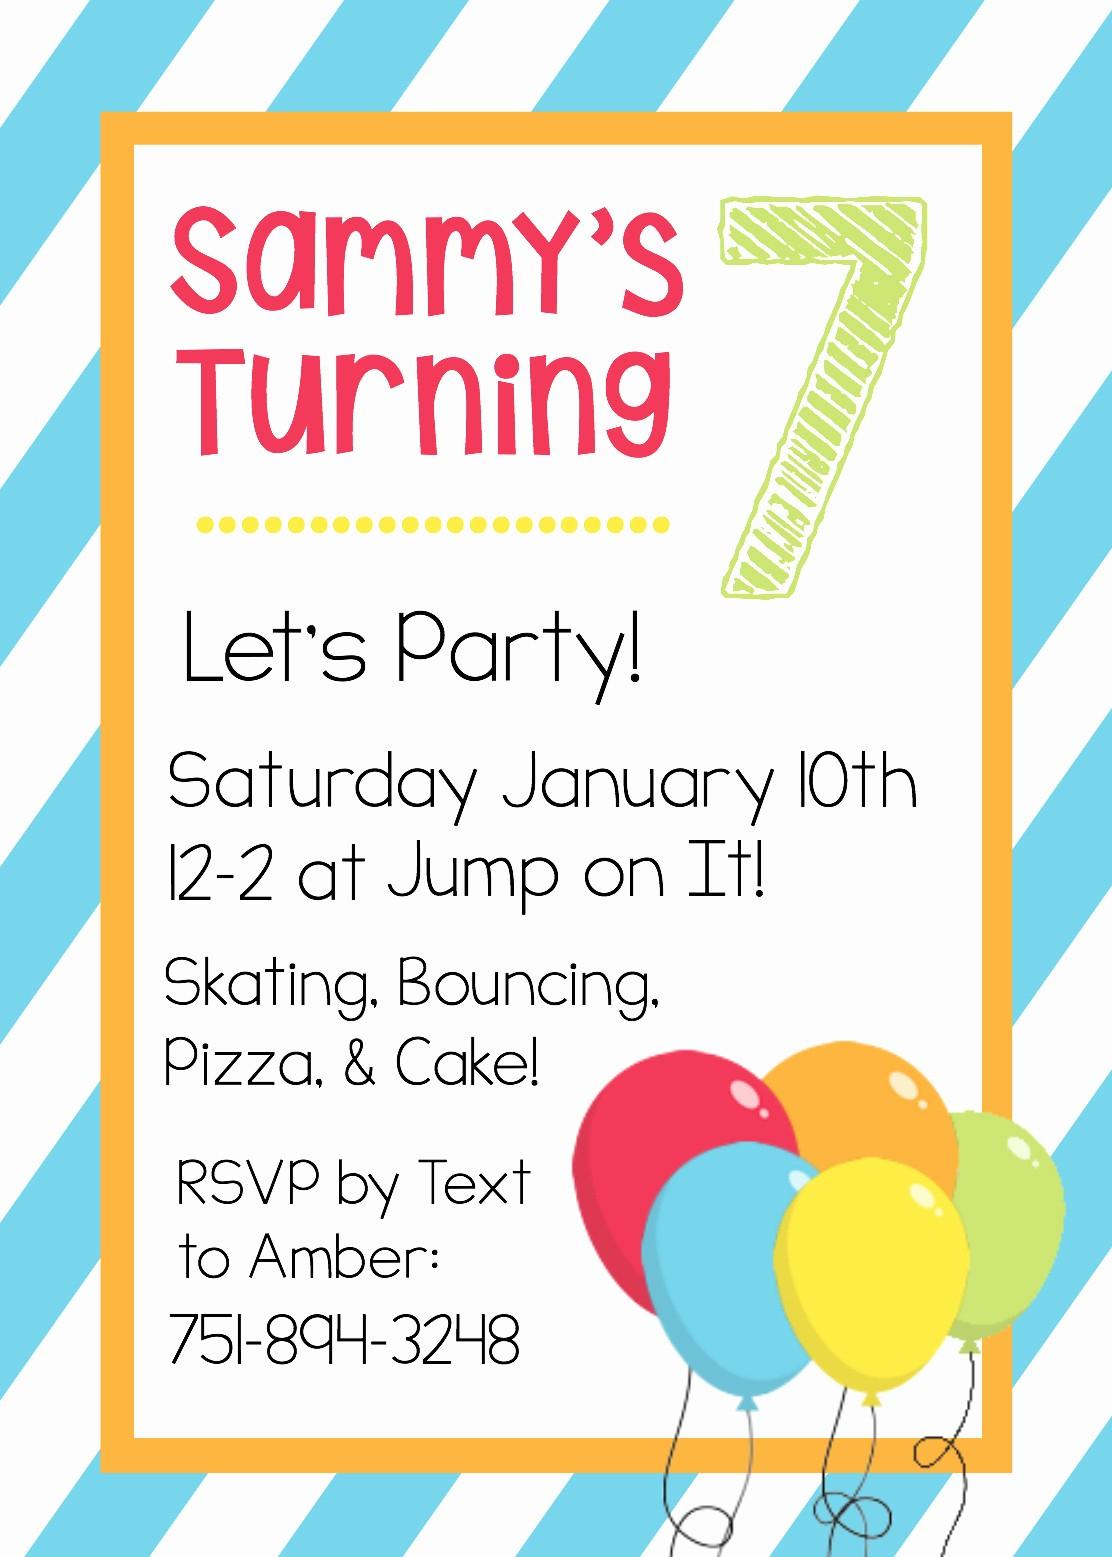 Free Templates for Birthday Invitations Inspirational Free Printable Birthday Invitation Templates